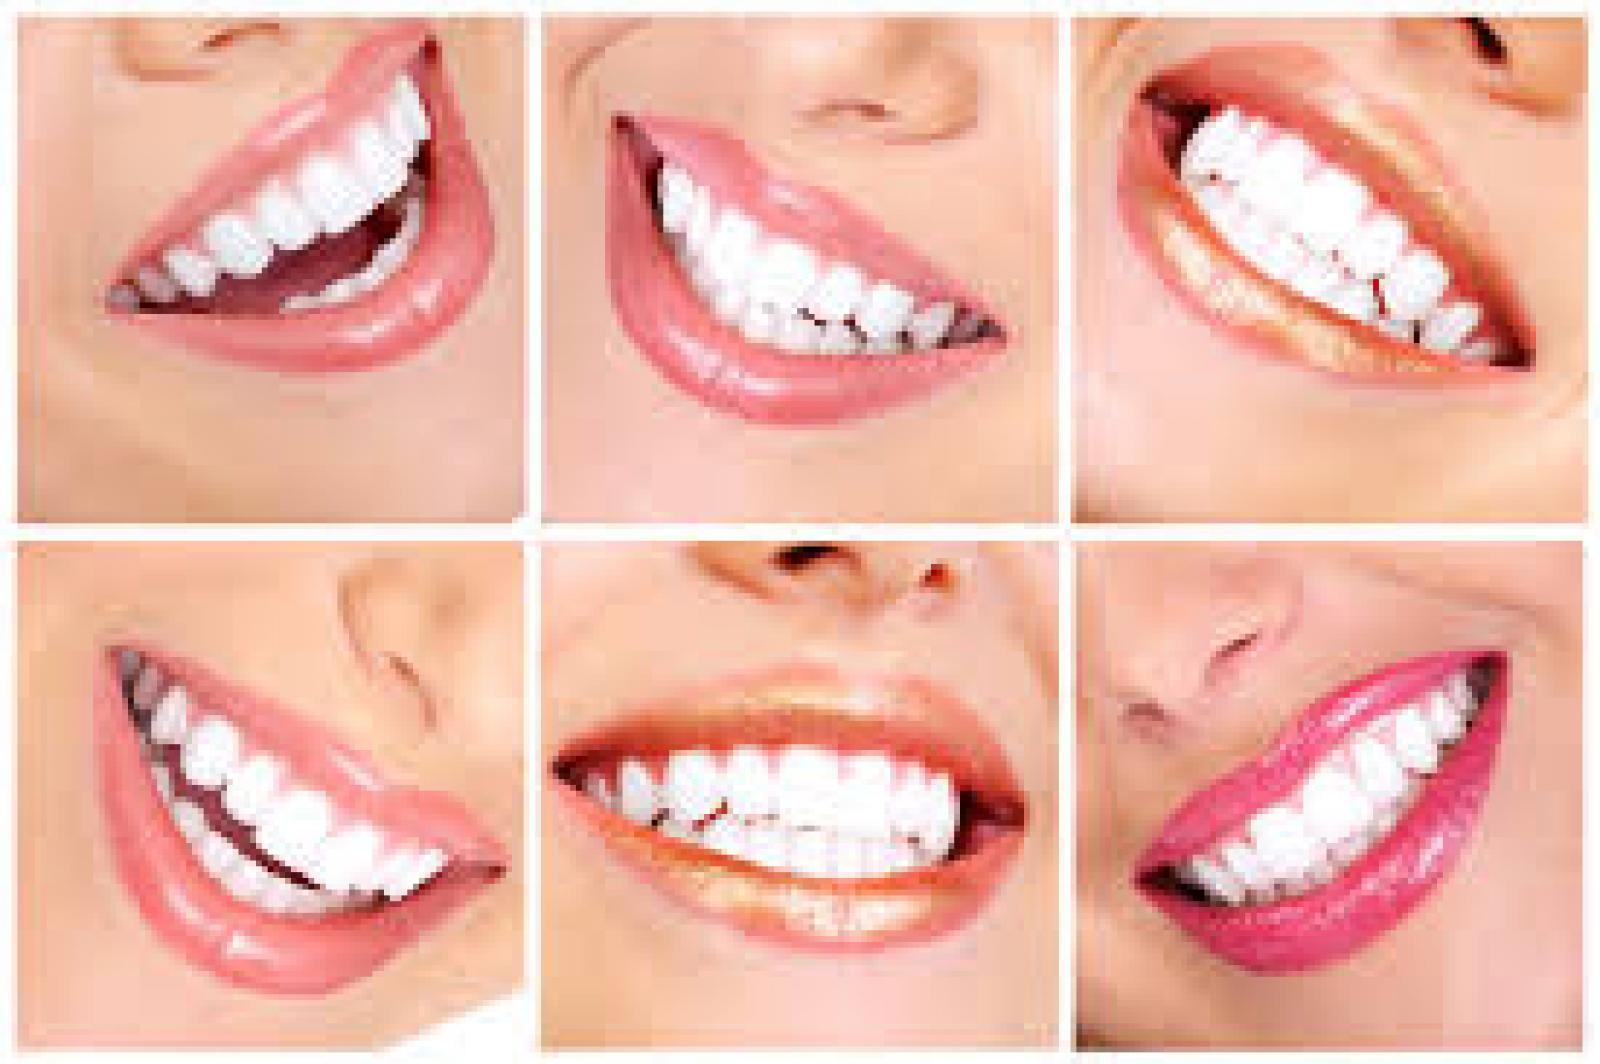 Dentists Chamber